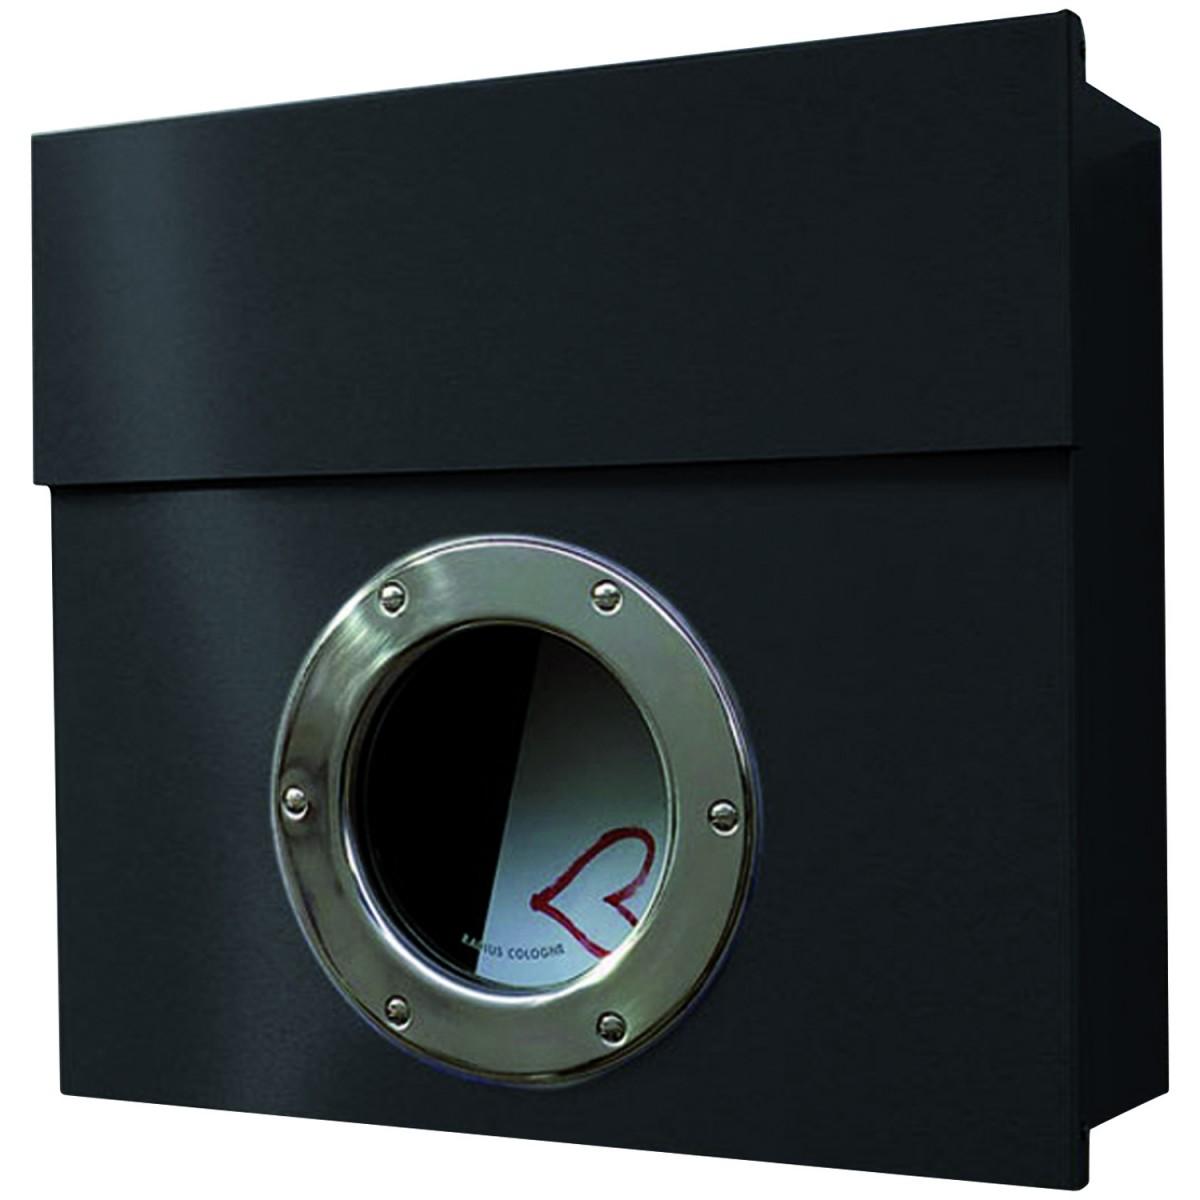 letterman 1 radius design briefkasten mit bullauge verdecktes schloss moderner wand postkasten. Black Bedroom Furniture Sets. Home Design Ideas